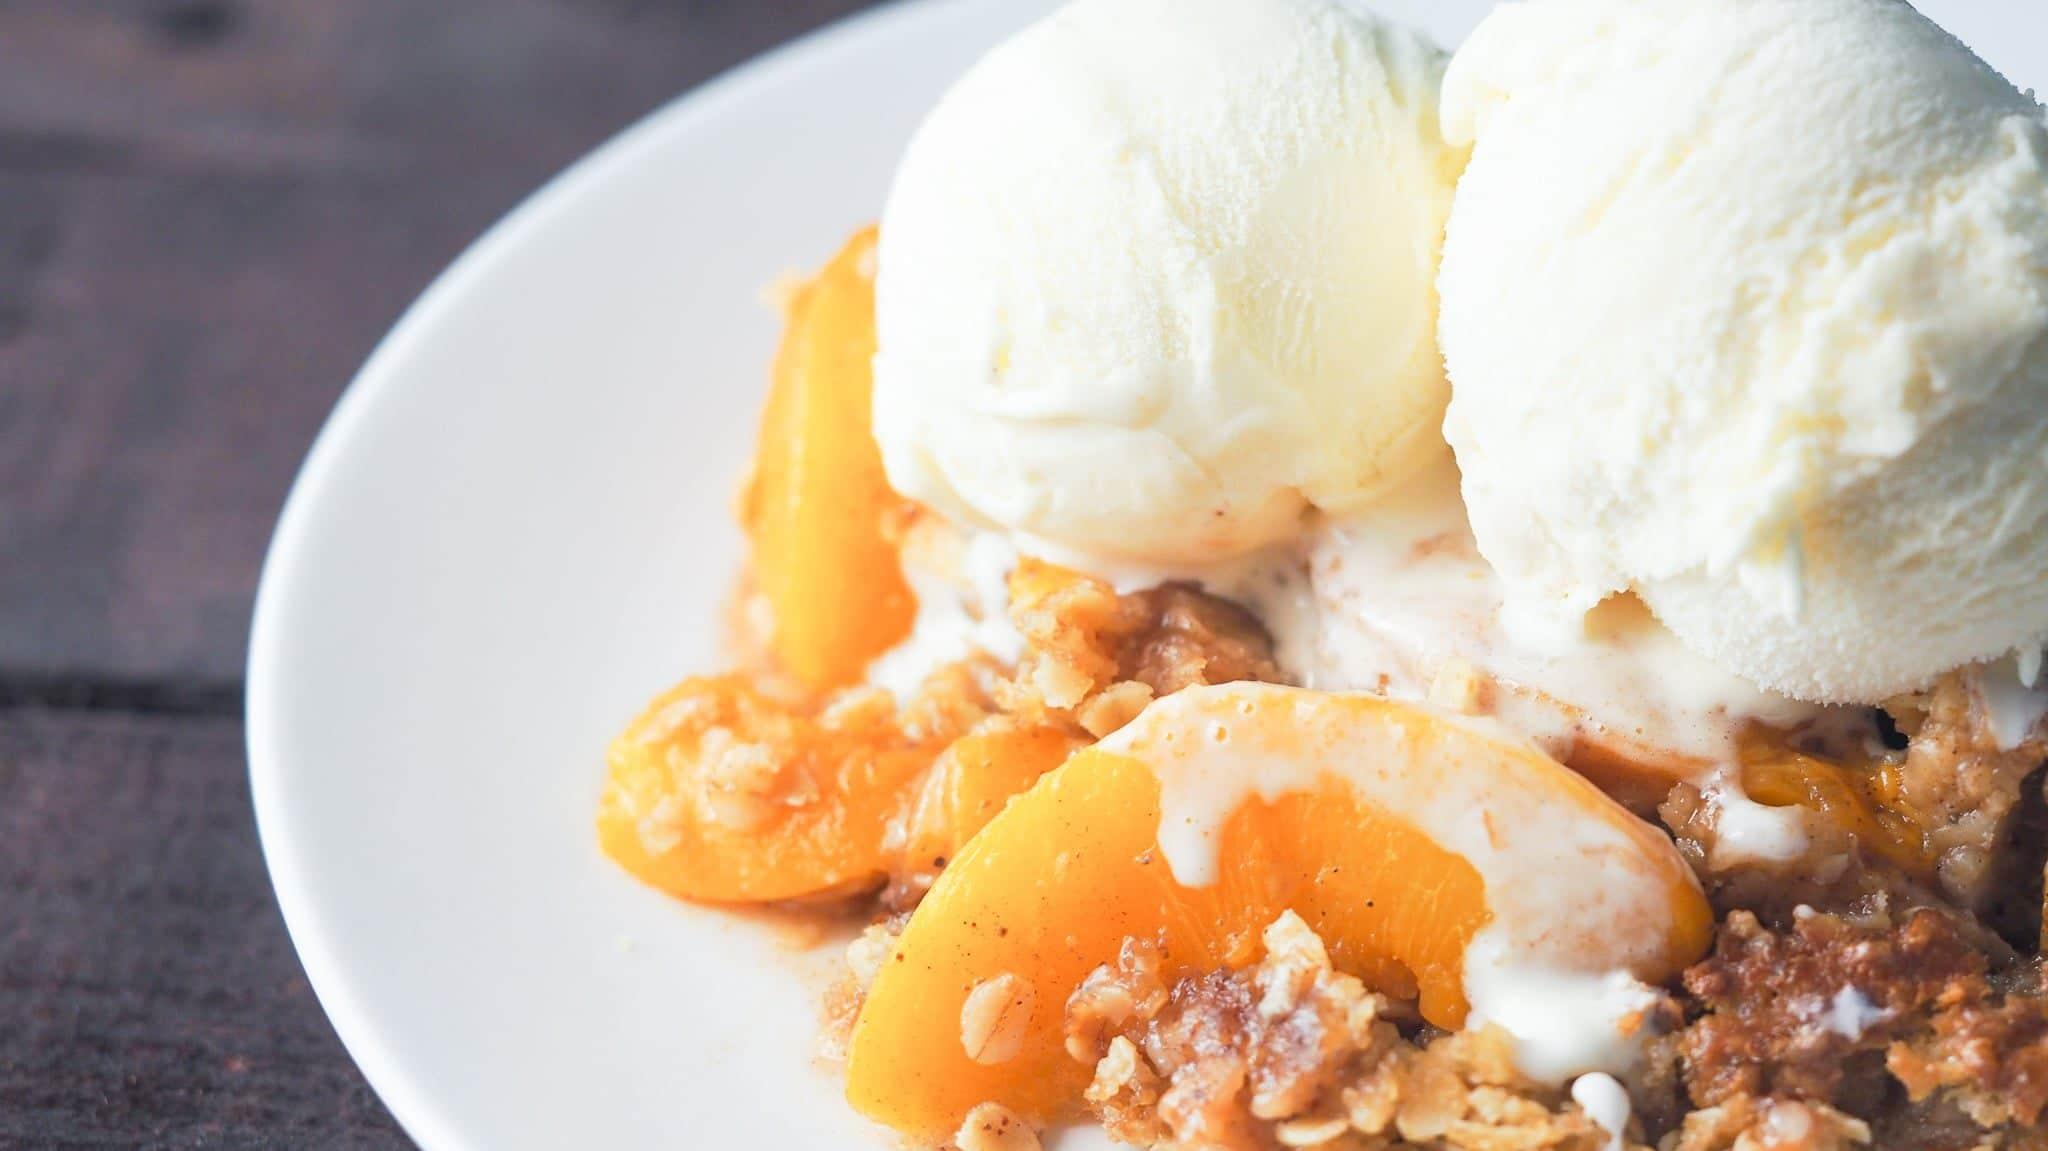 Delicious Instant Pot Spiced Peach Crisp